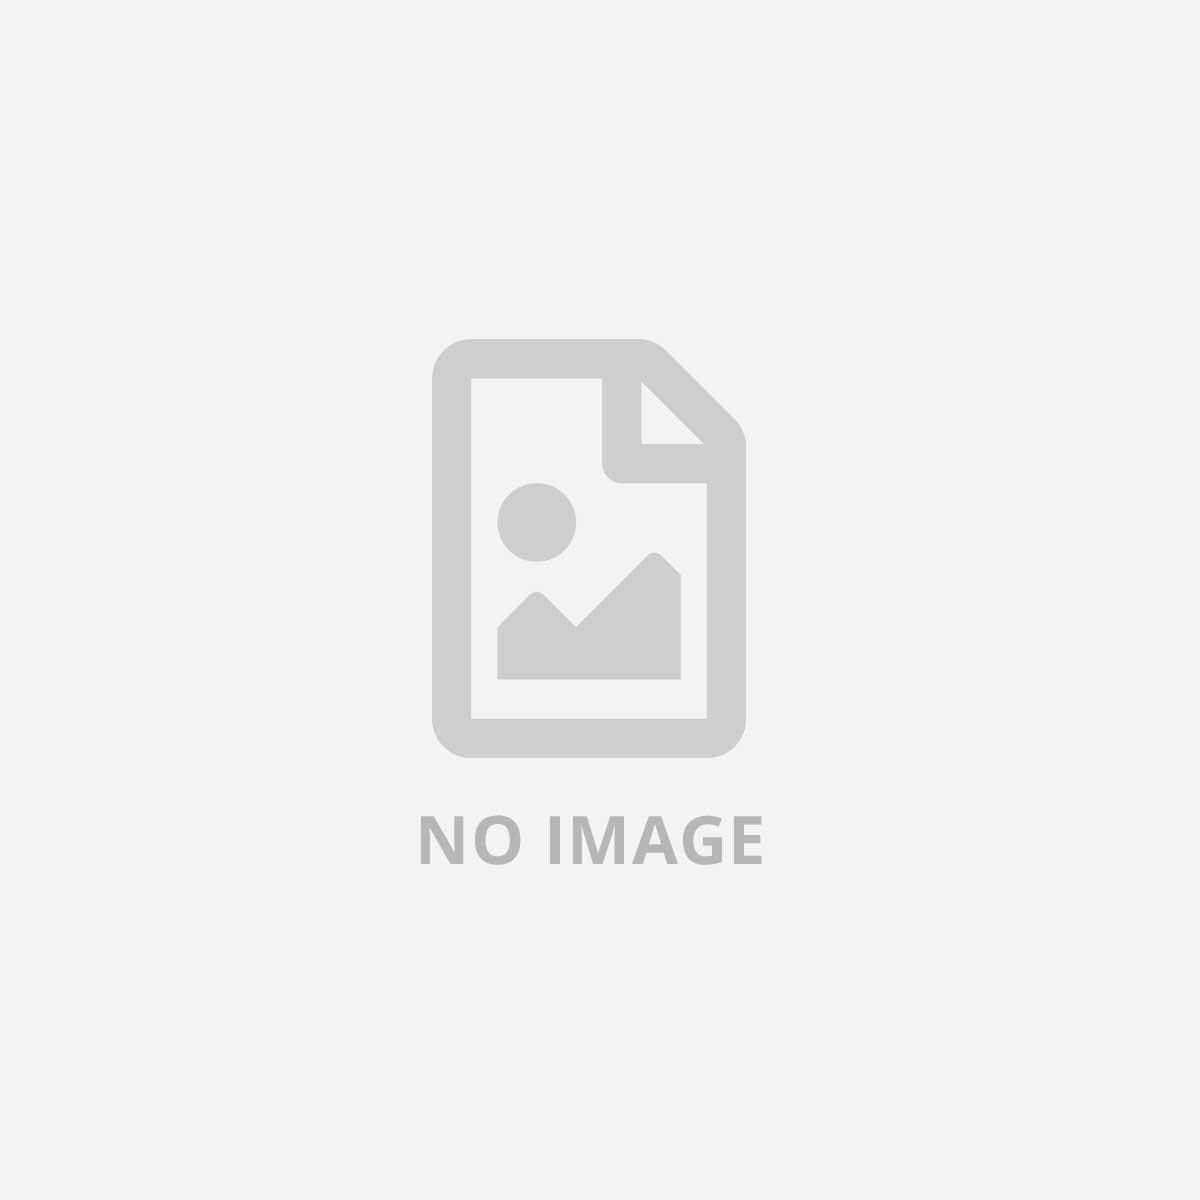 WESTERN DIGITAL MAINSTREAM LAPTOP 500GB 2.5P